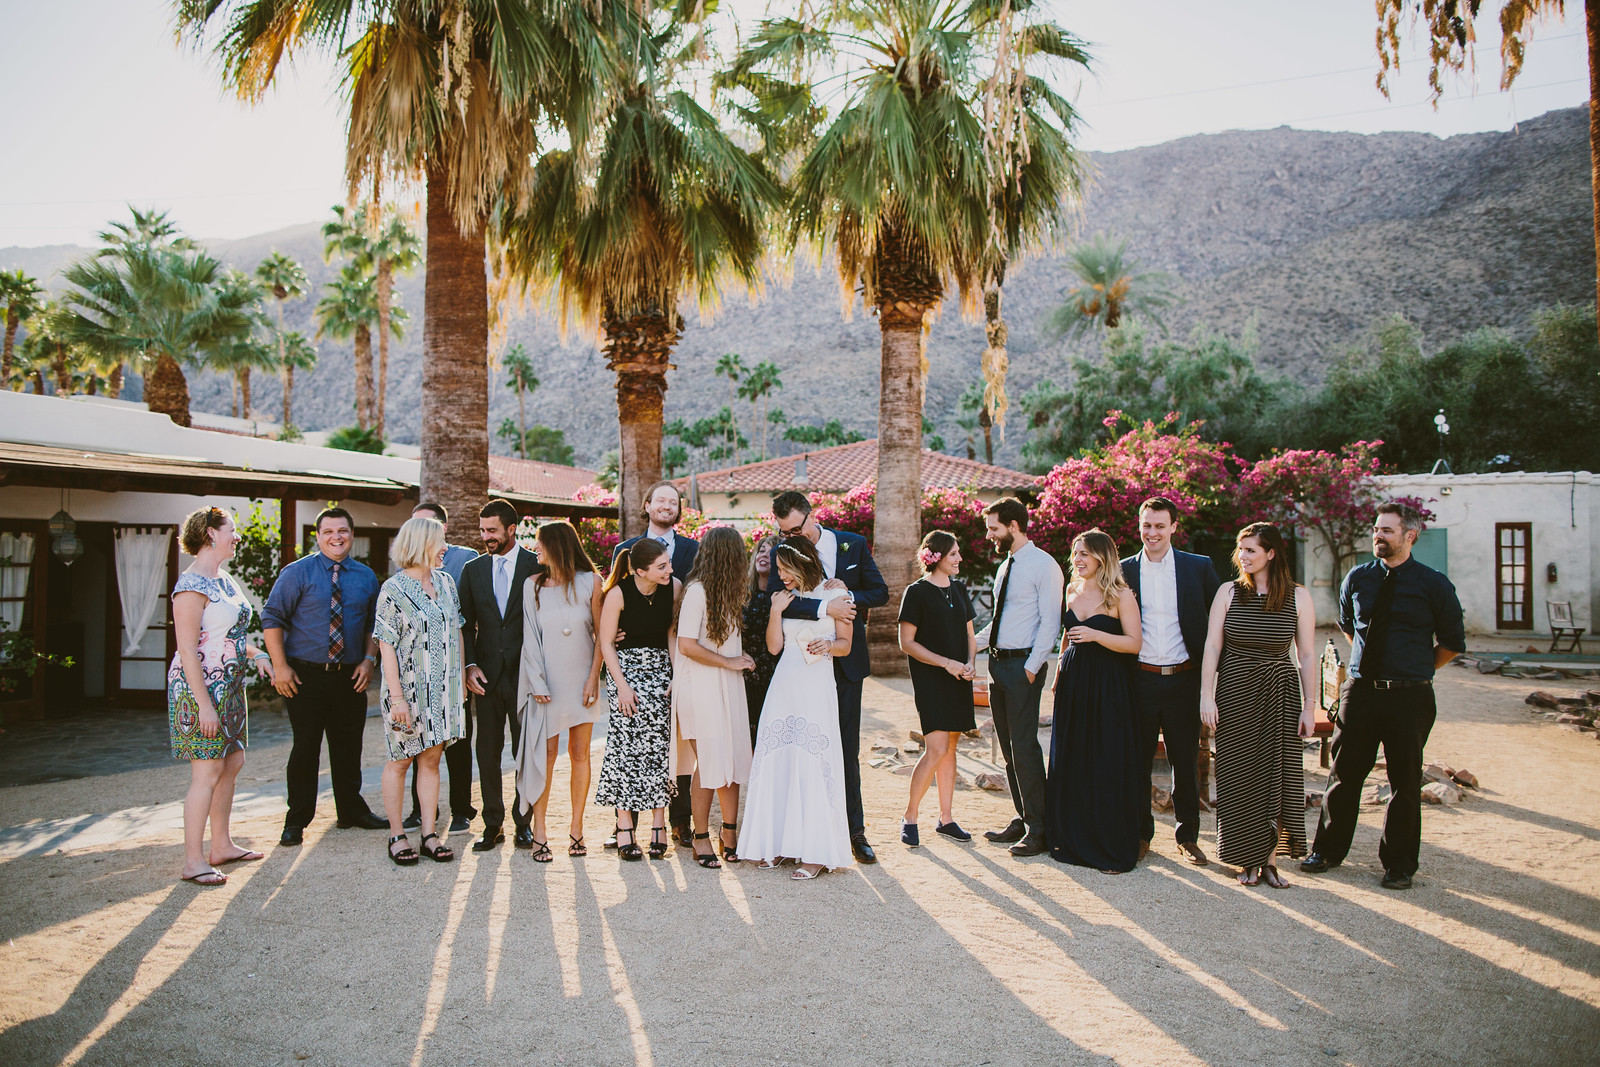 korakia-pensione-Wedding12.jpg